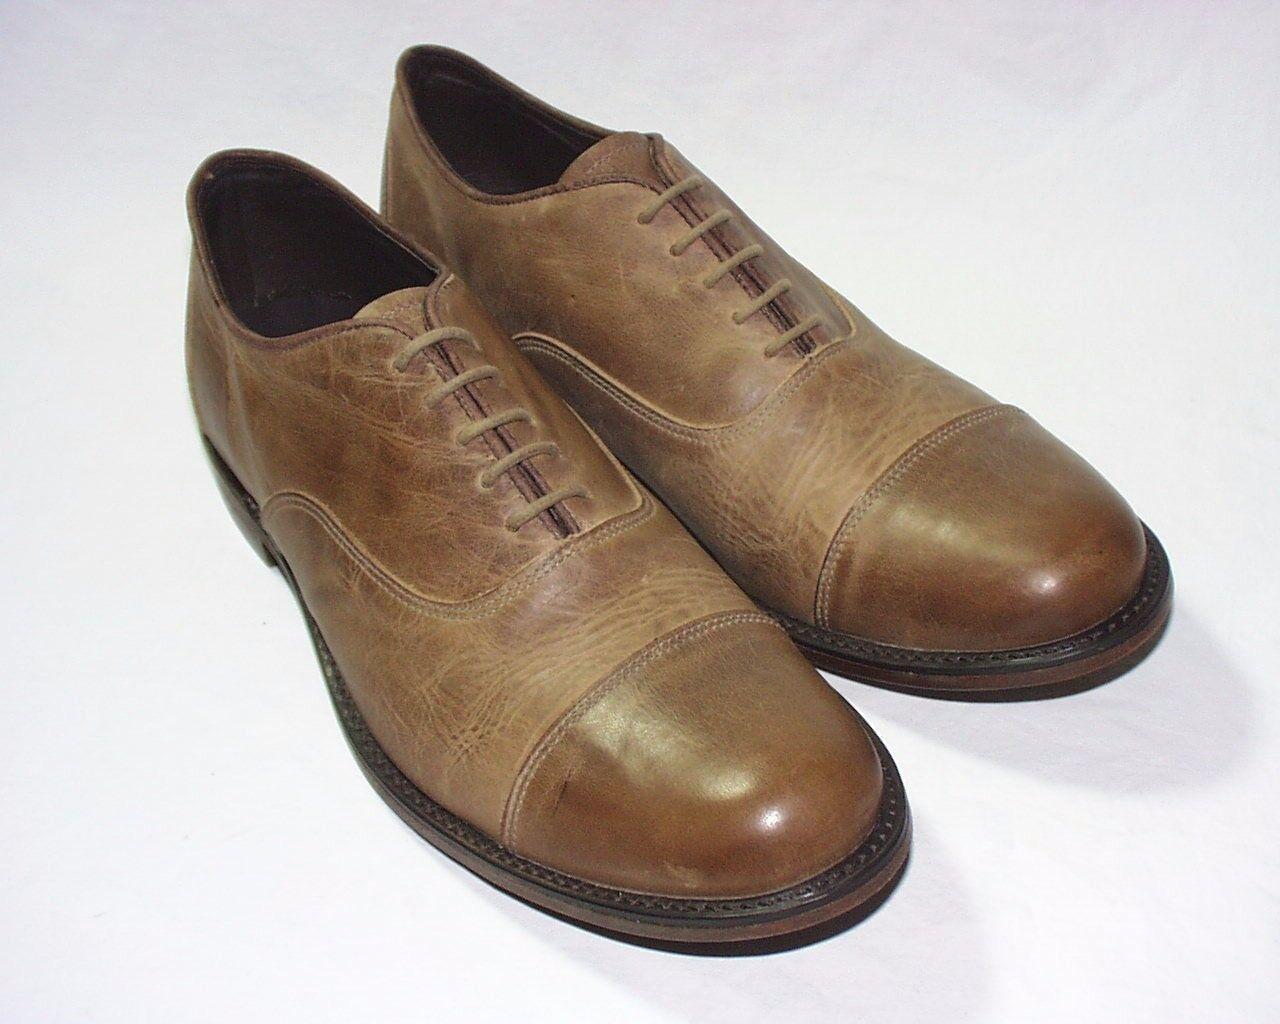 Vintage schuhe Company Company Company Barron Cap Toe Oxfords, Distressed Leather Upper, Tan, New 955076